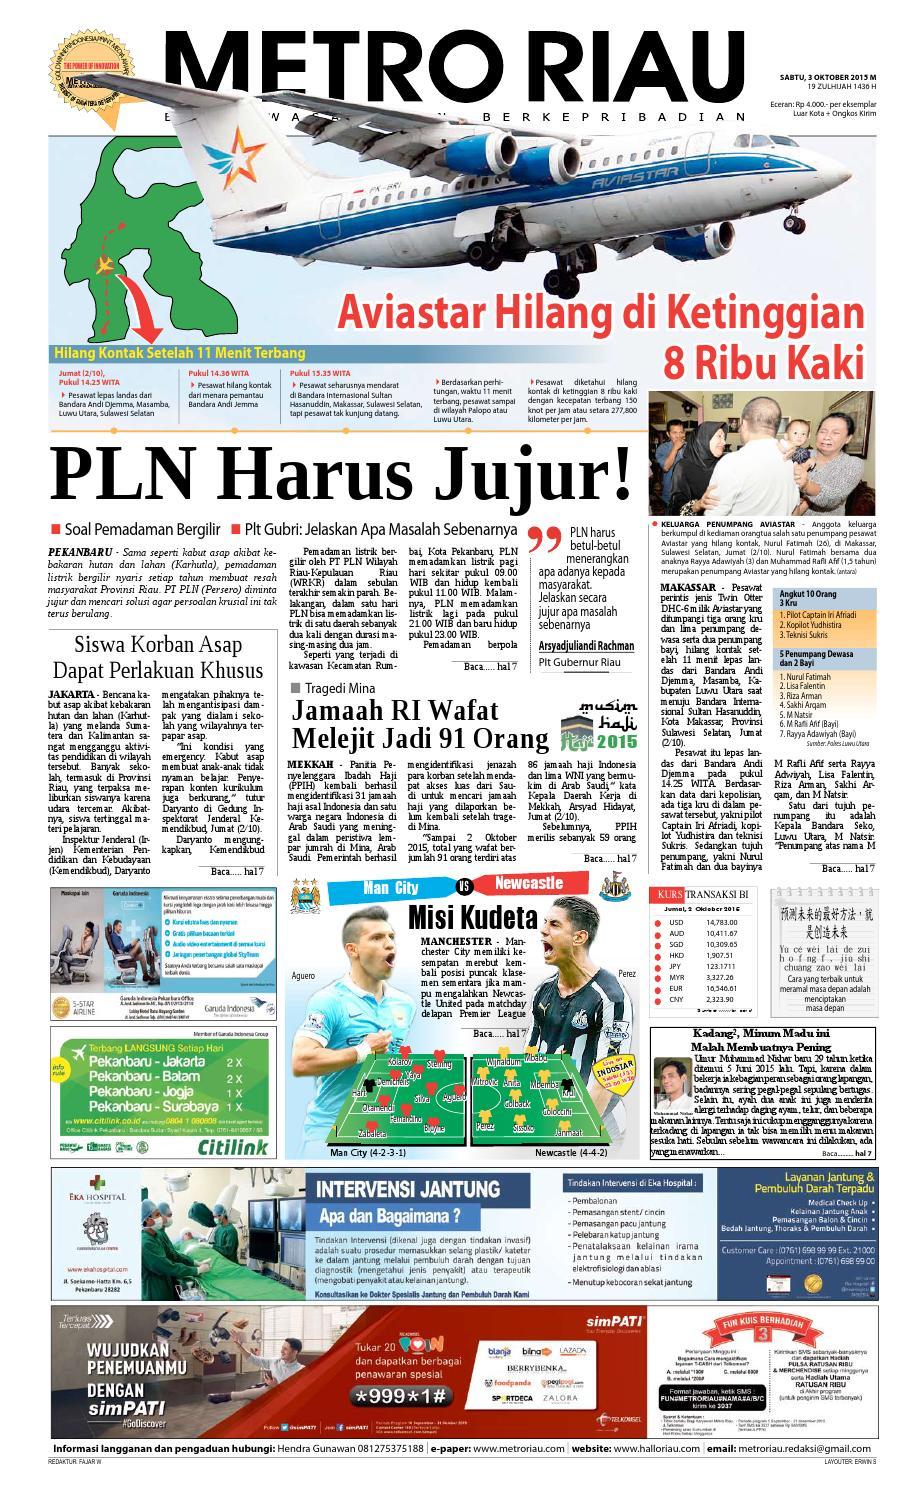 03102015 By Harian Pagi Metro Riau Issuu Produk Ukm Bumn Batik Tulis Warna Alam Ra Ampamp